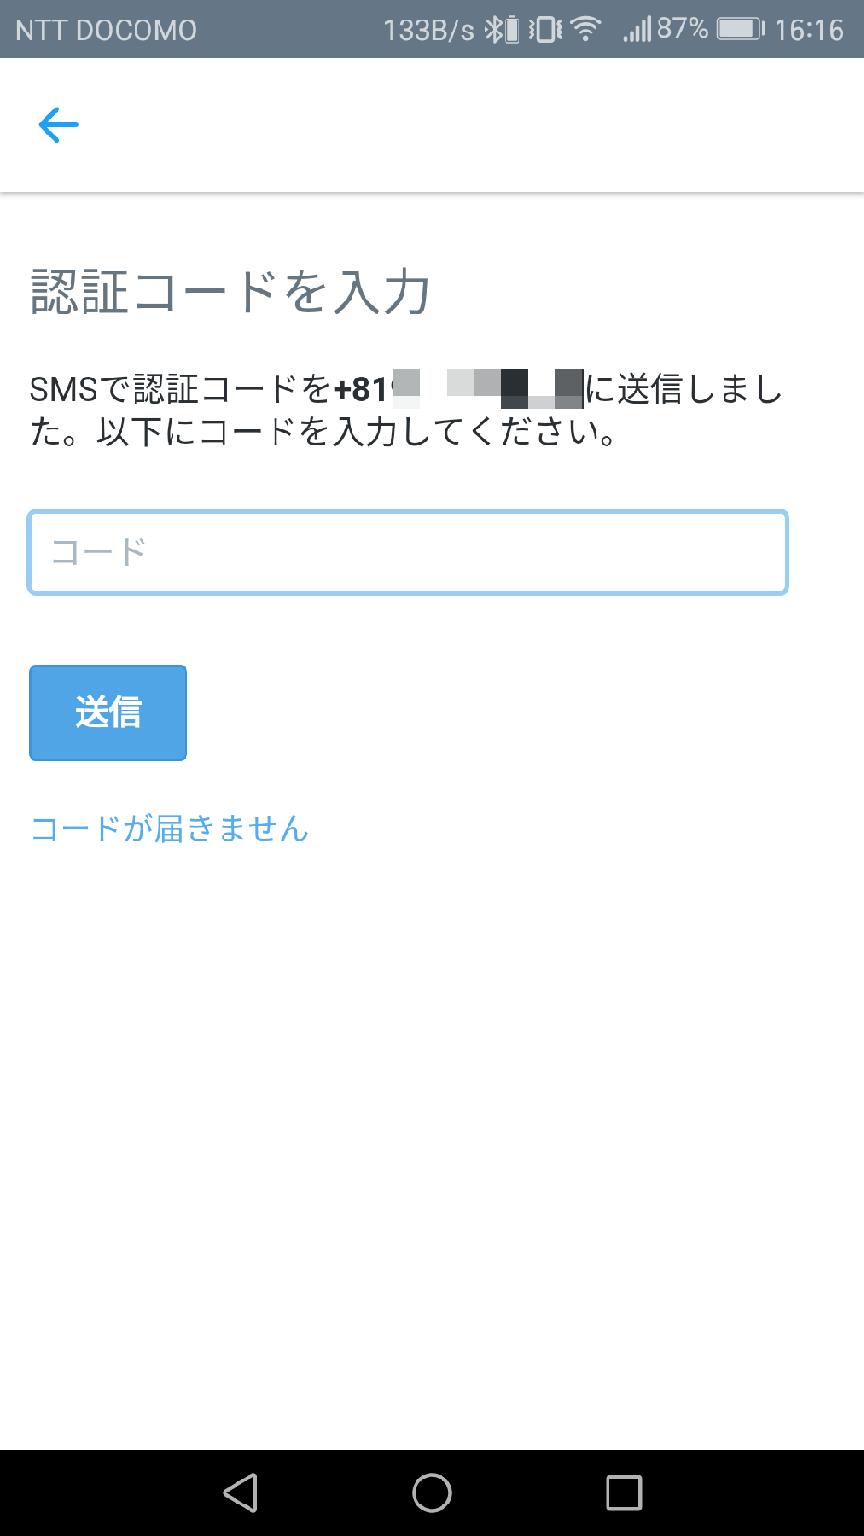 Twitter(ツイッター)の[認証コードを入力]画面